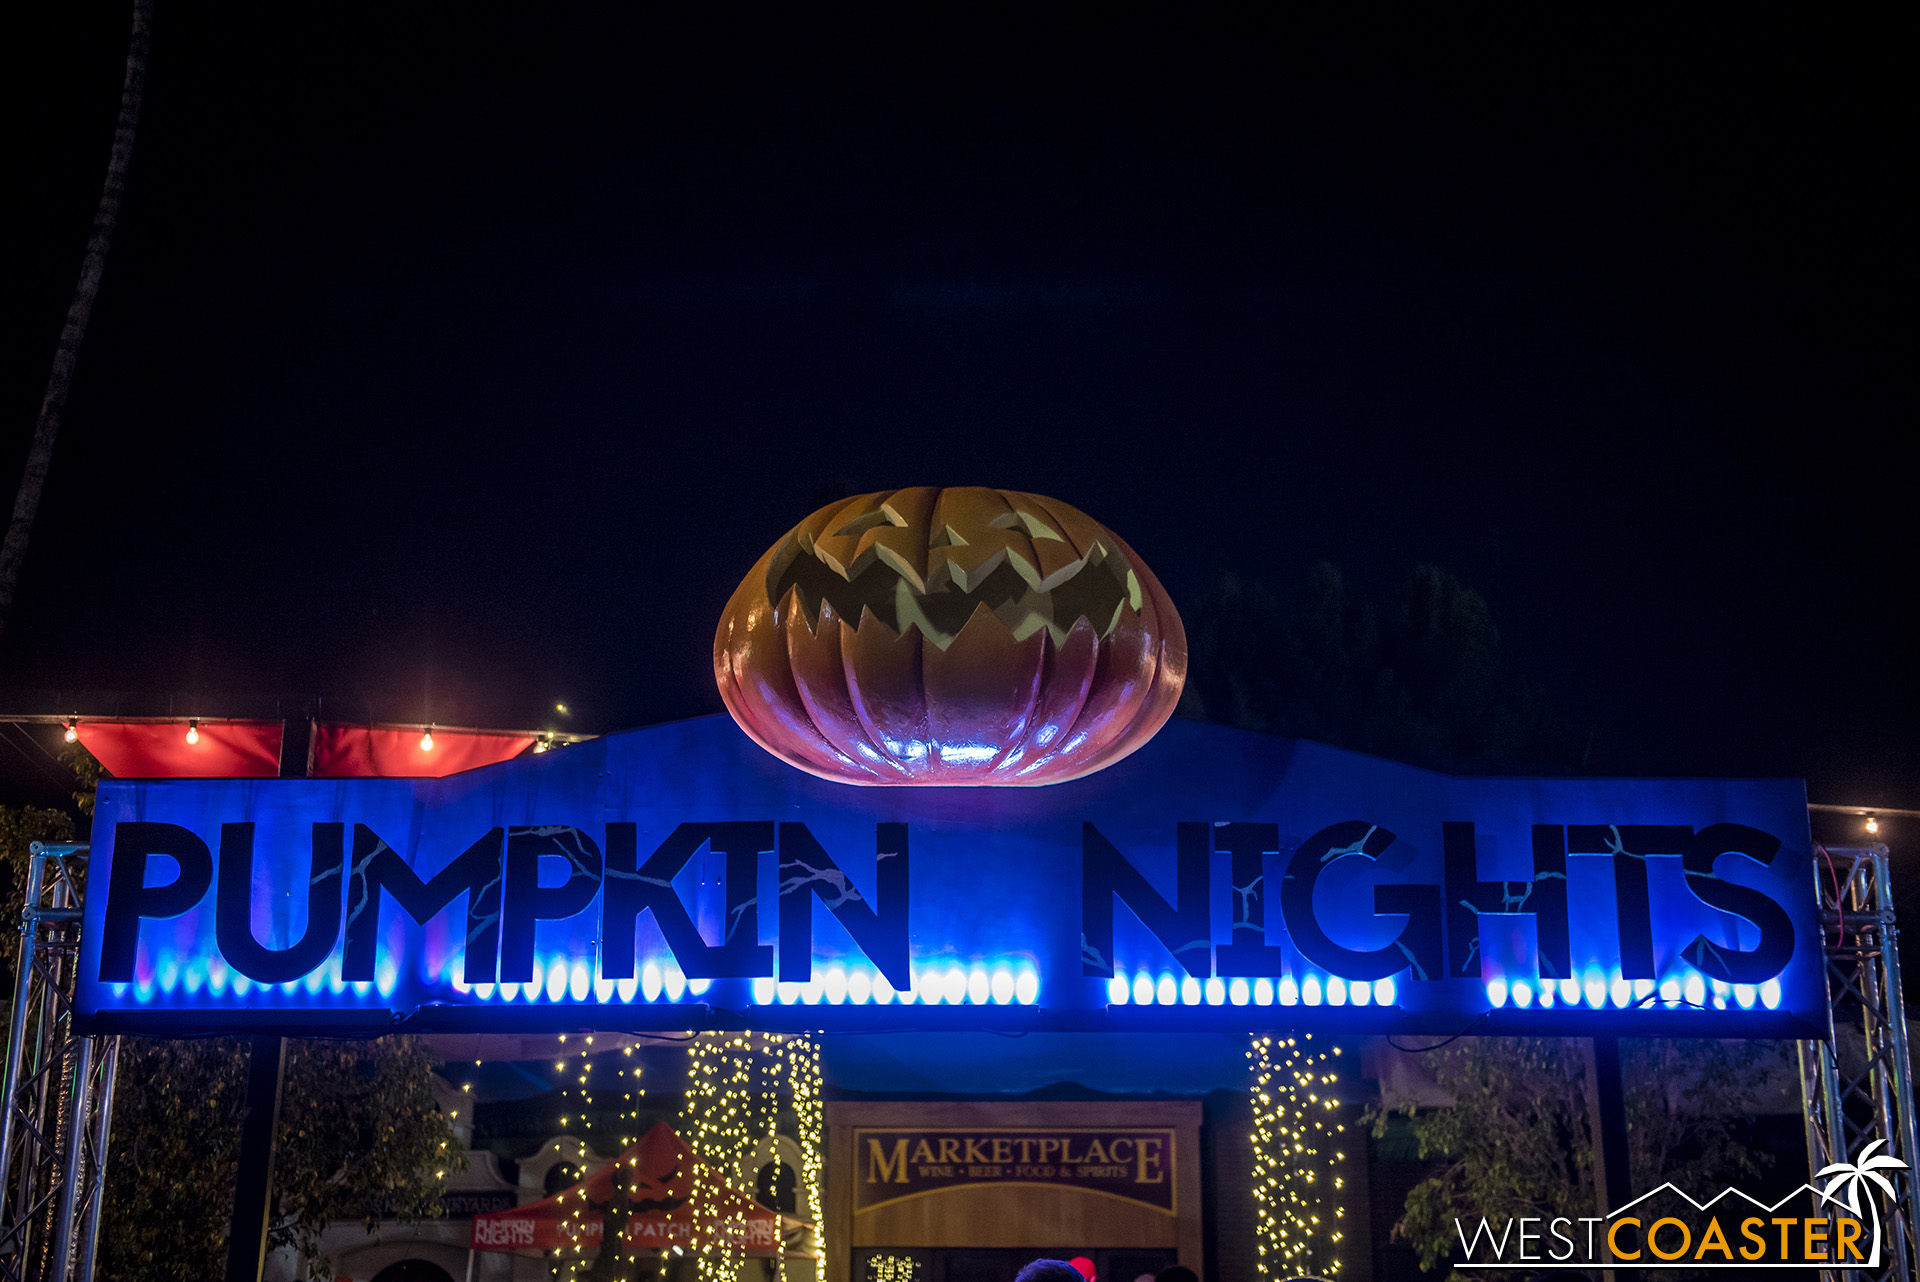 Entering Pumpkin Nights…